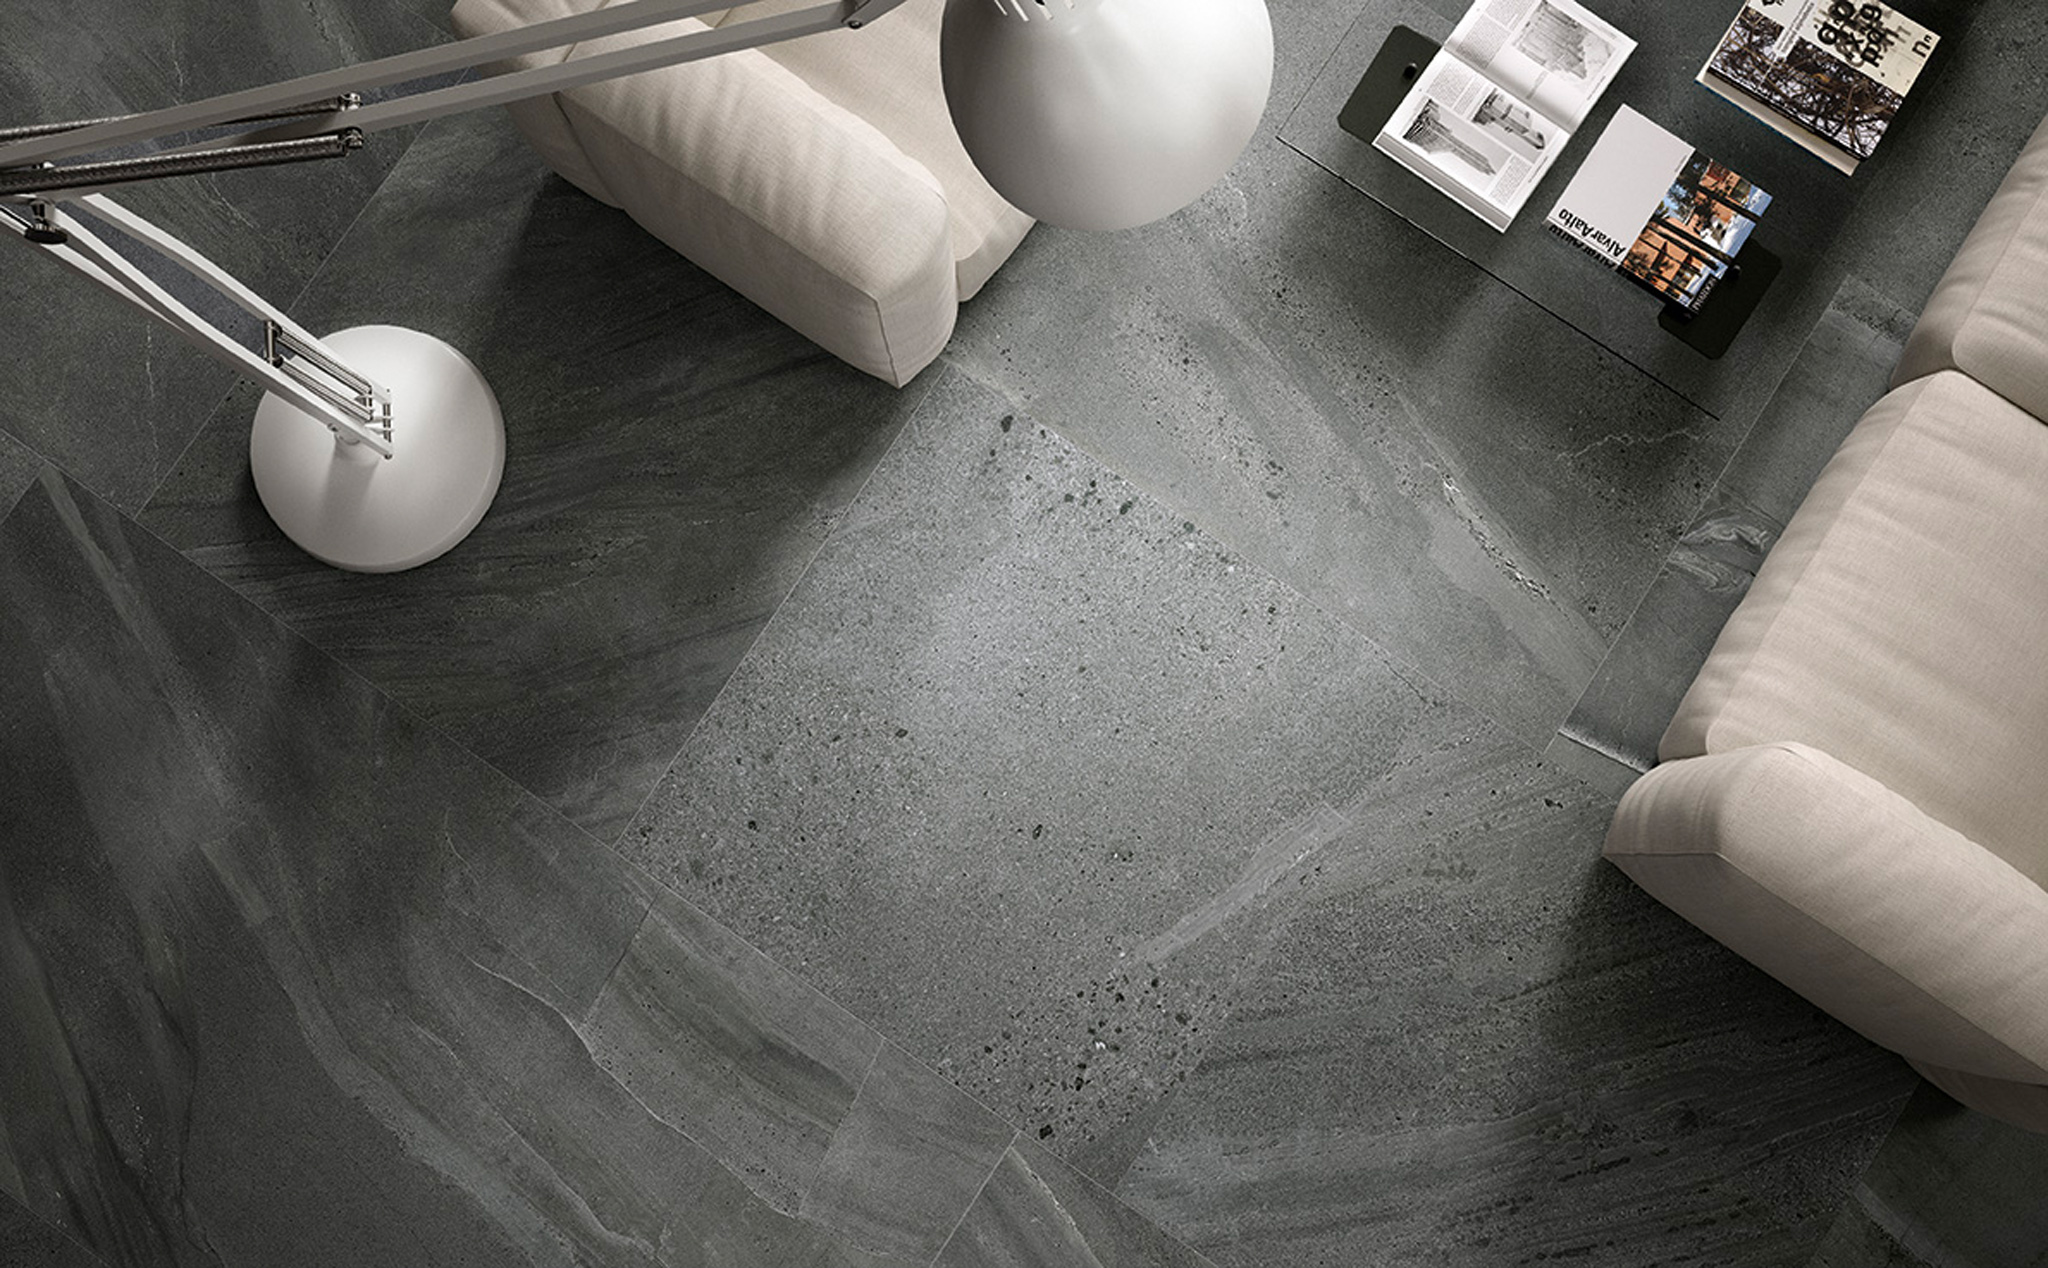 porcelain tile images: Capolavoro range high quality photo